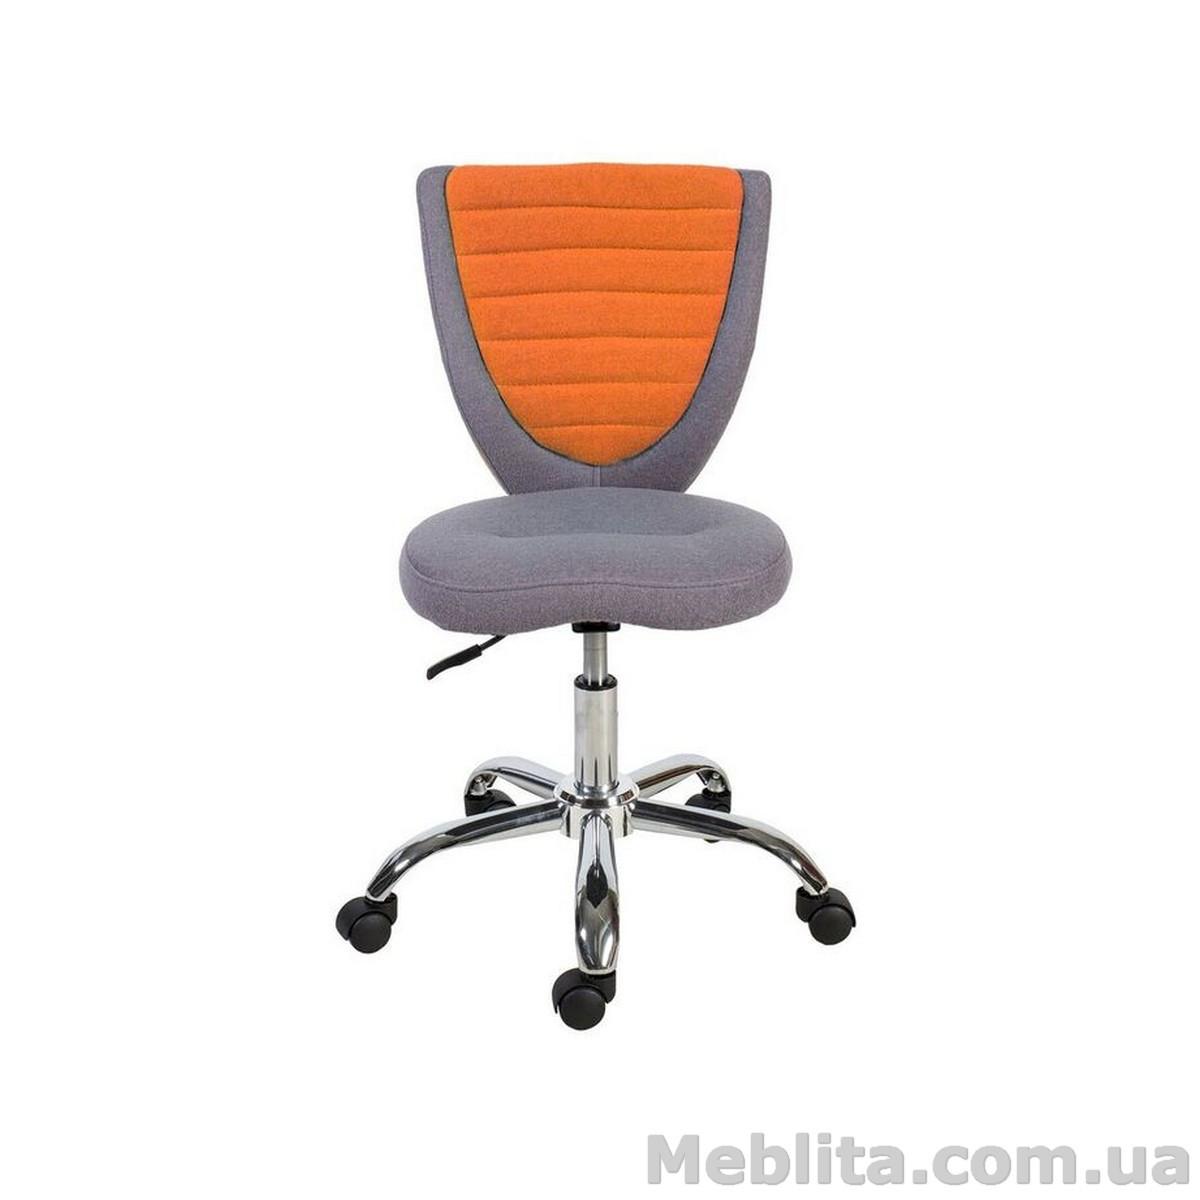 Кресло офисное POPPY, серо-оранжевое Office4You